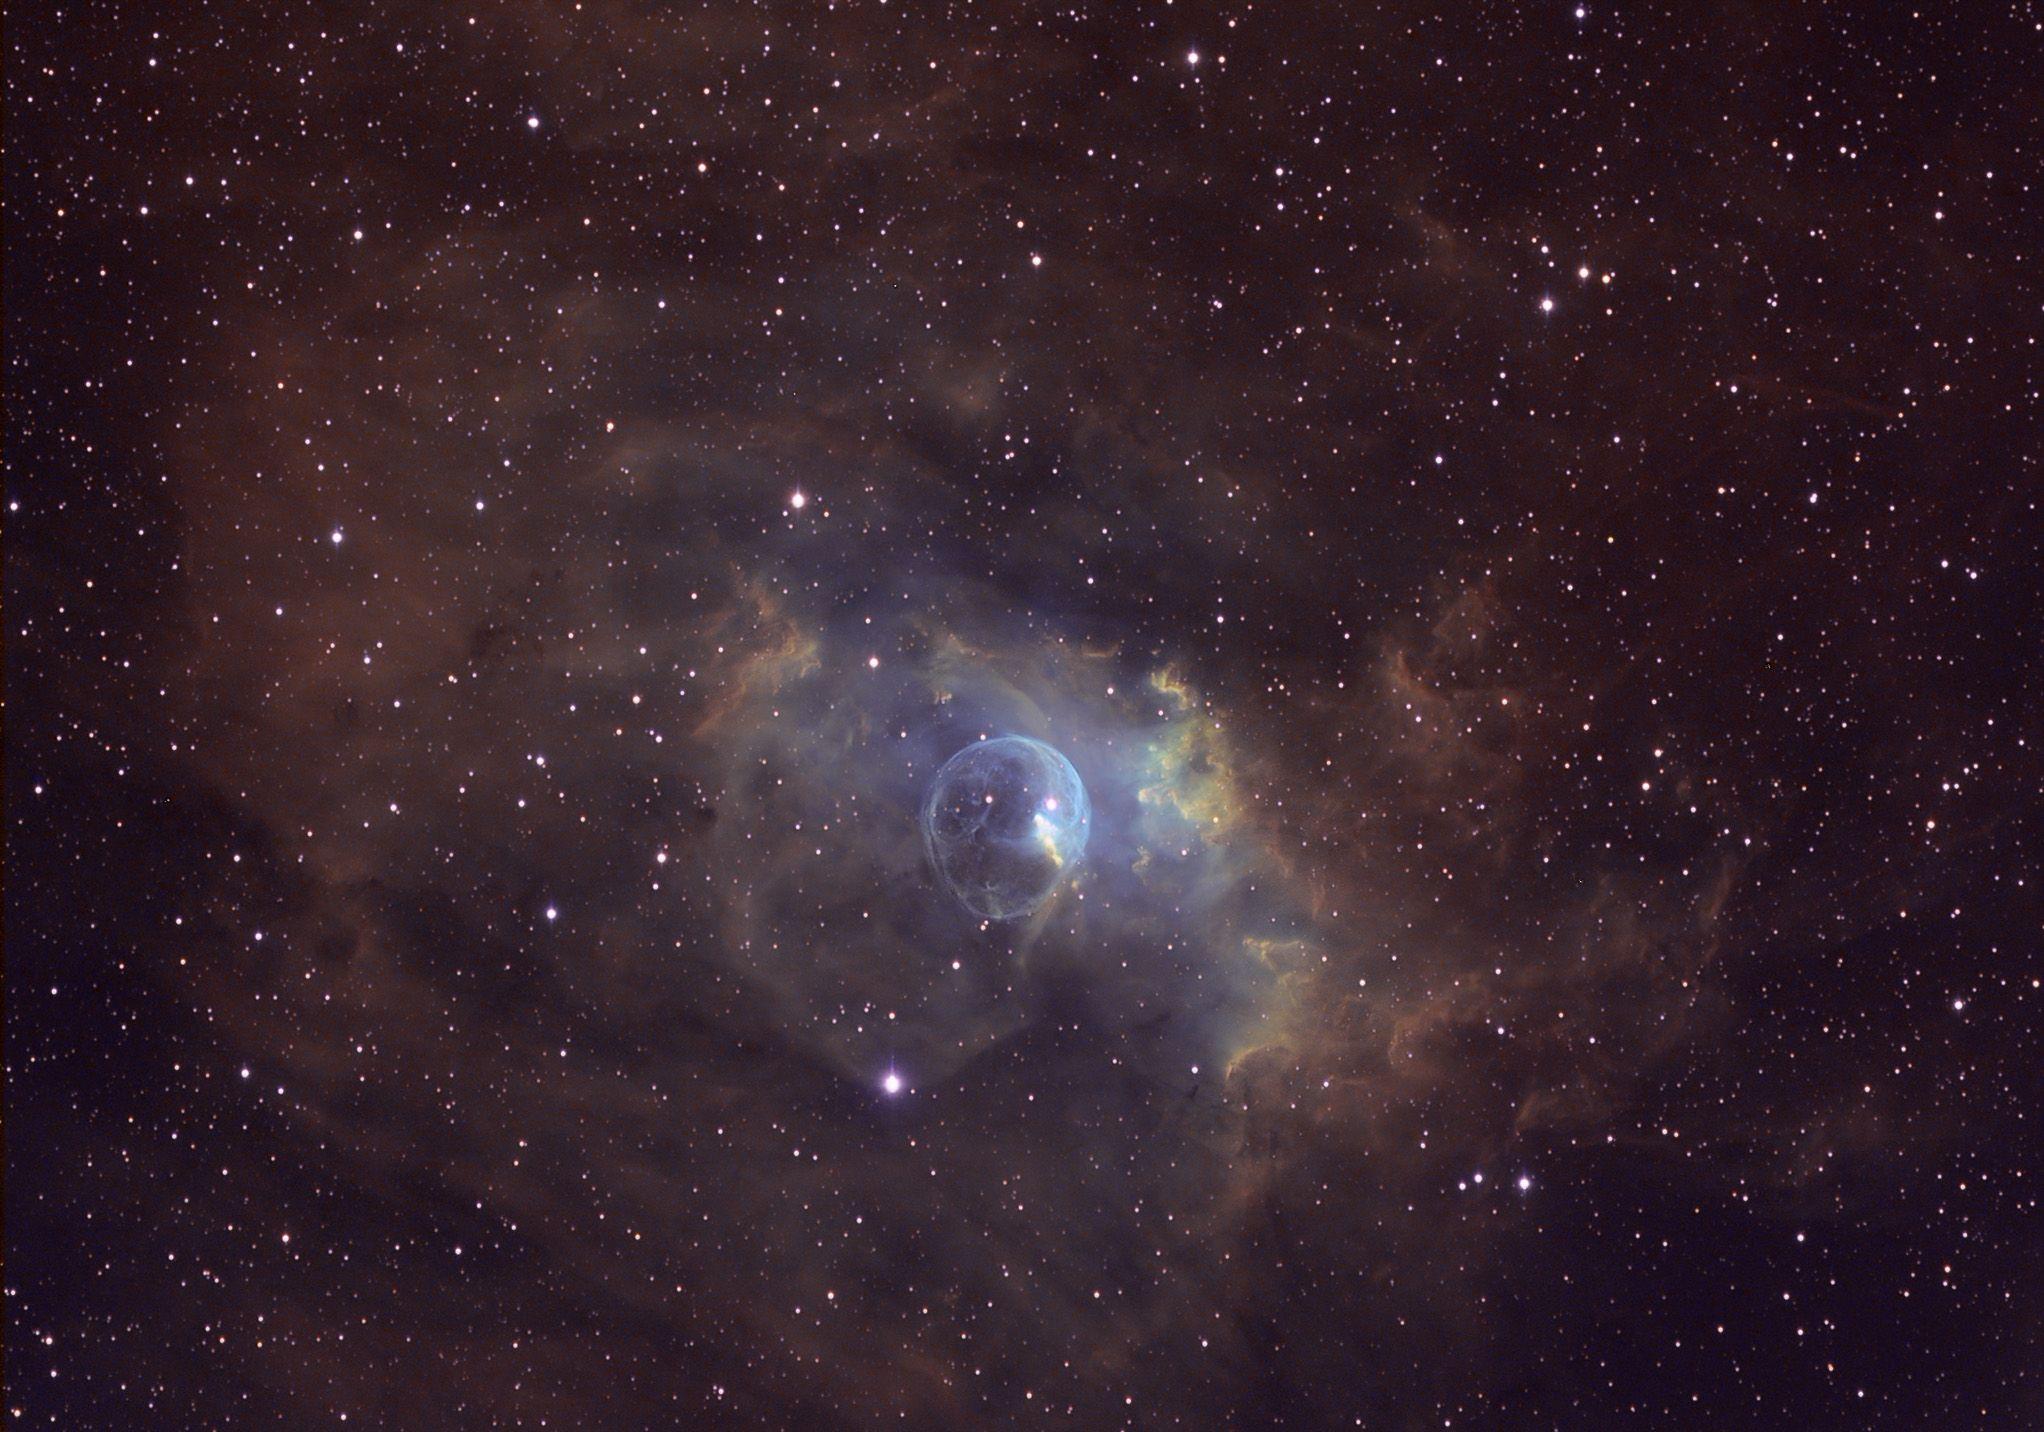 NGC 7635 – The Bubble Nebula | Nebula, Outer space, Deep space